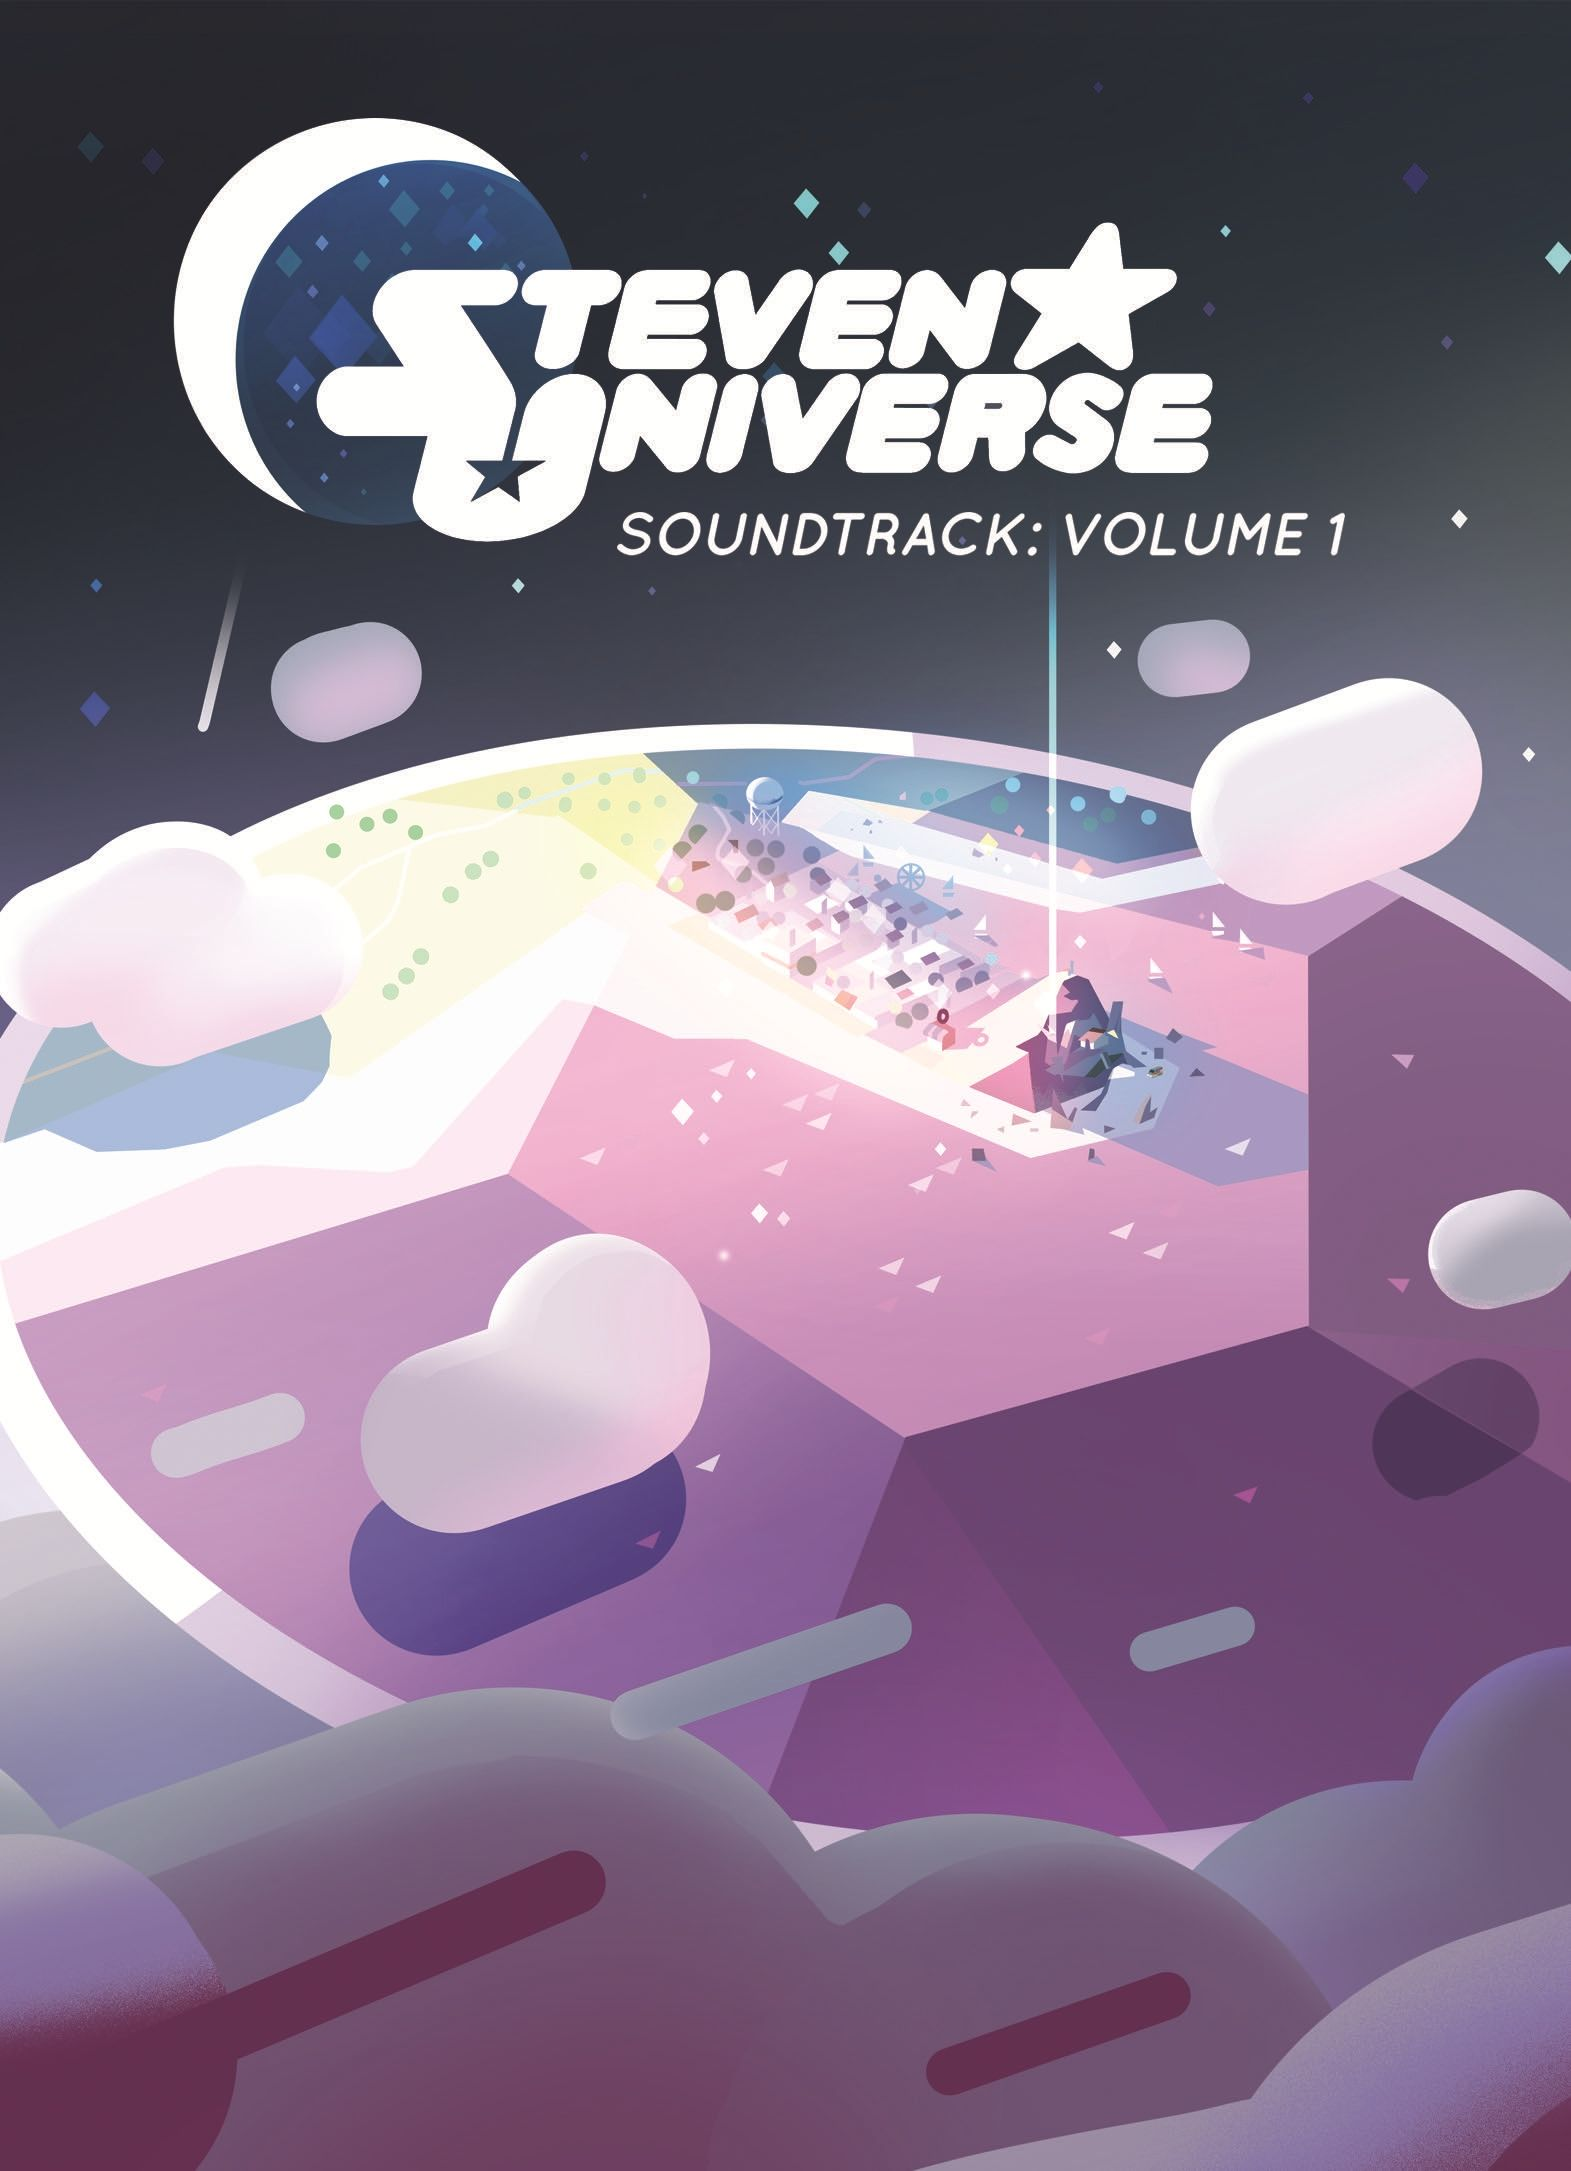 Steven Universe, Vol. 1